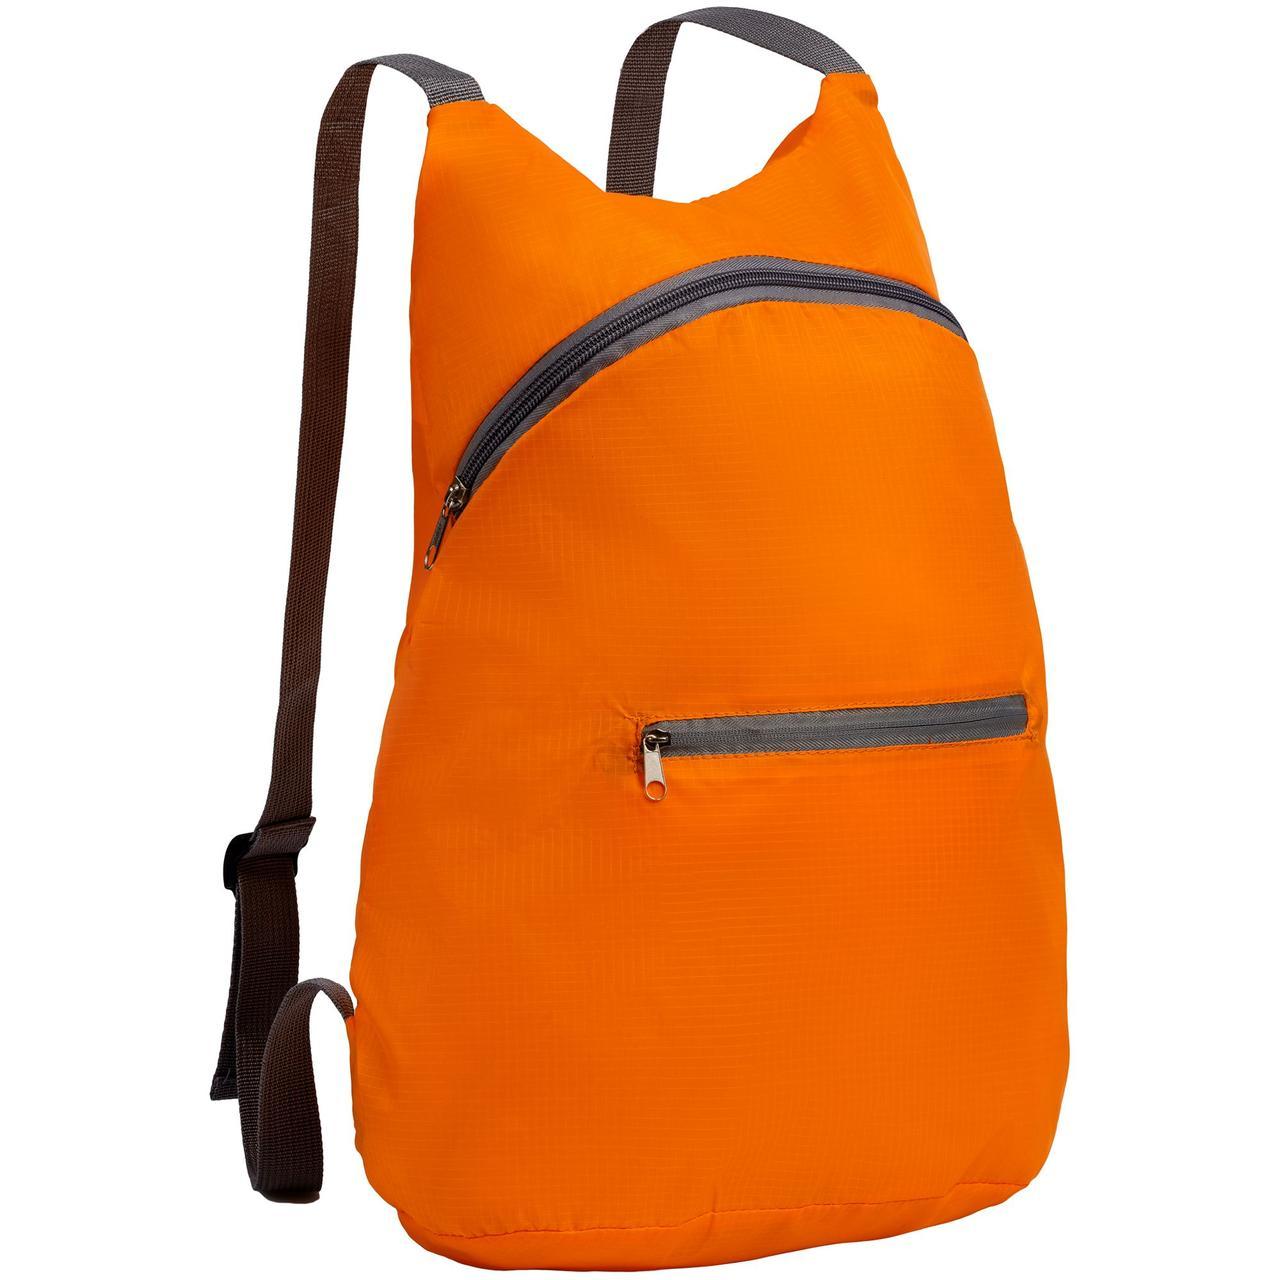 Складной рюкзак Barcelona, оранжевый (артикул 12672.20)